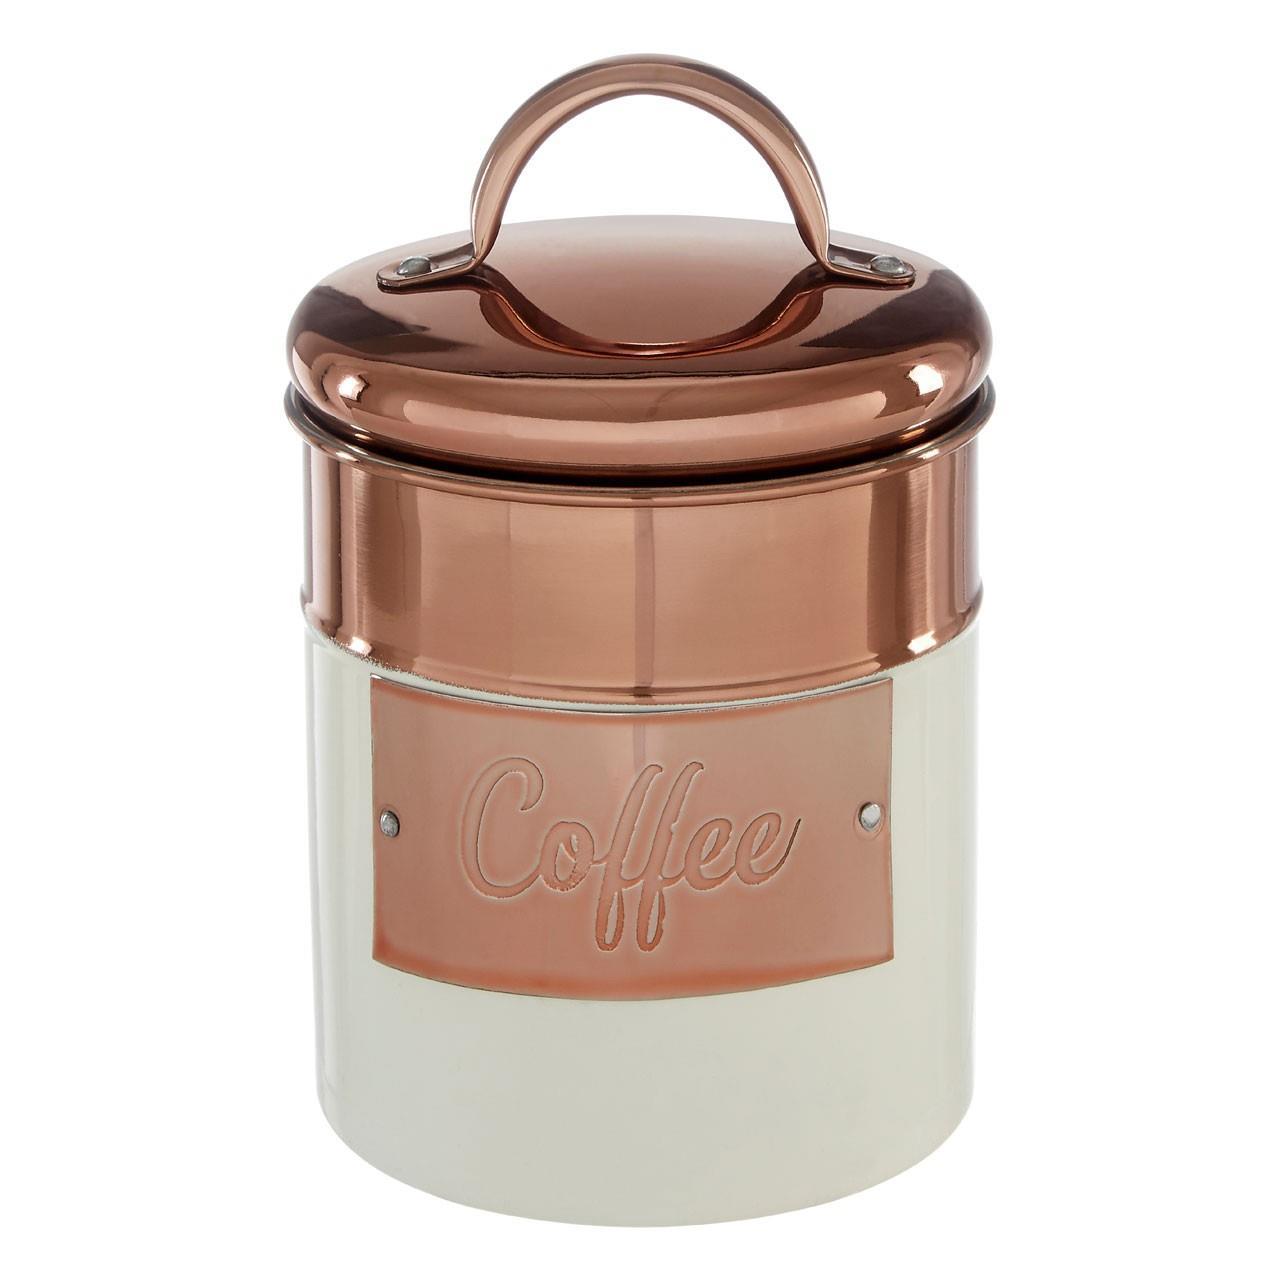 Prescott-Cream-Copper-Bread-Bin-Biscuit-Sugar-Coffee-Canister-Utensil-Holder thumbnail 15